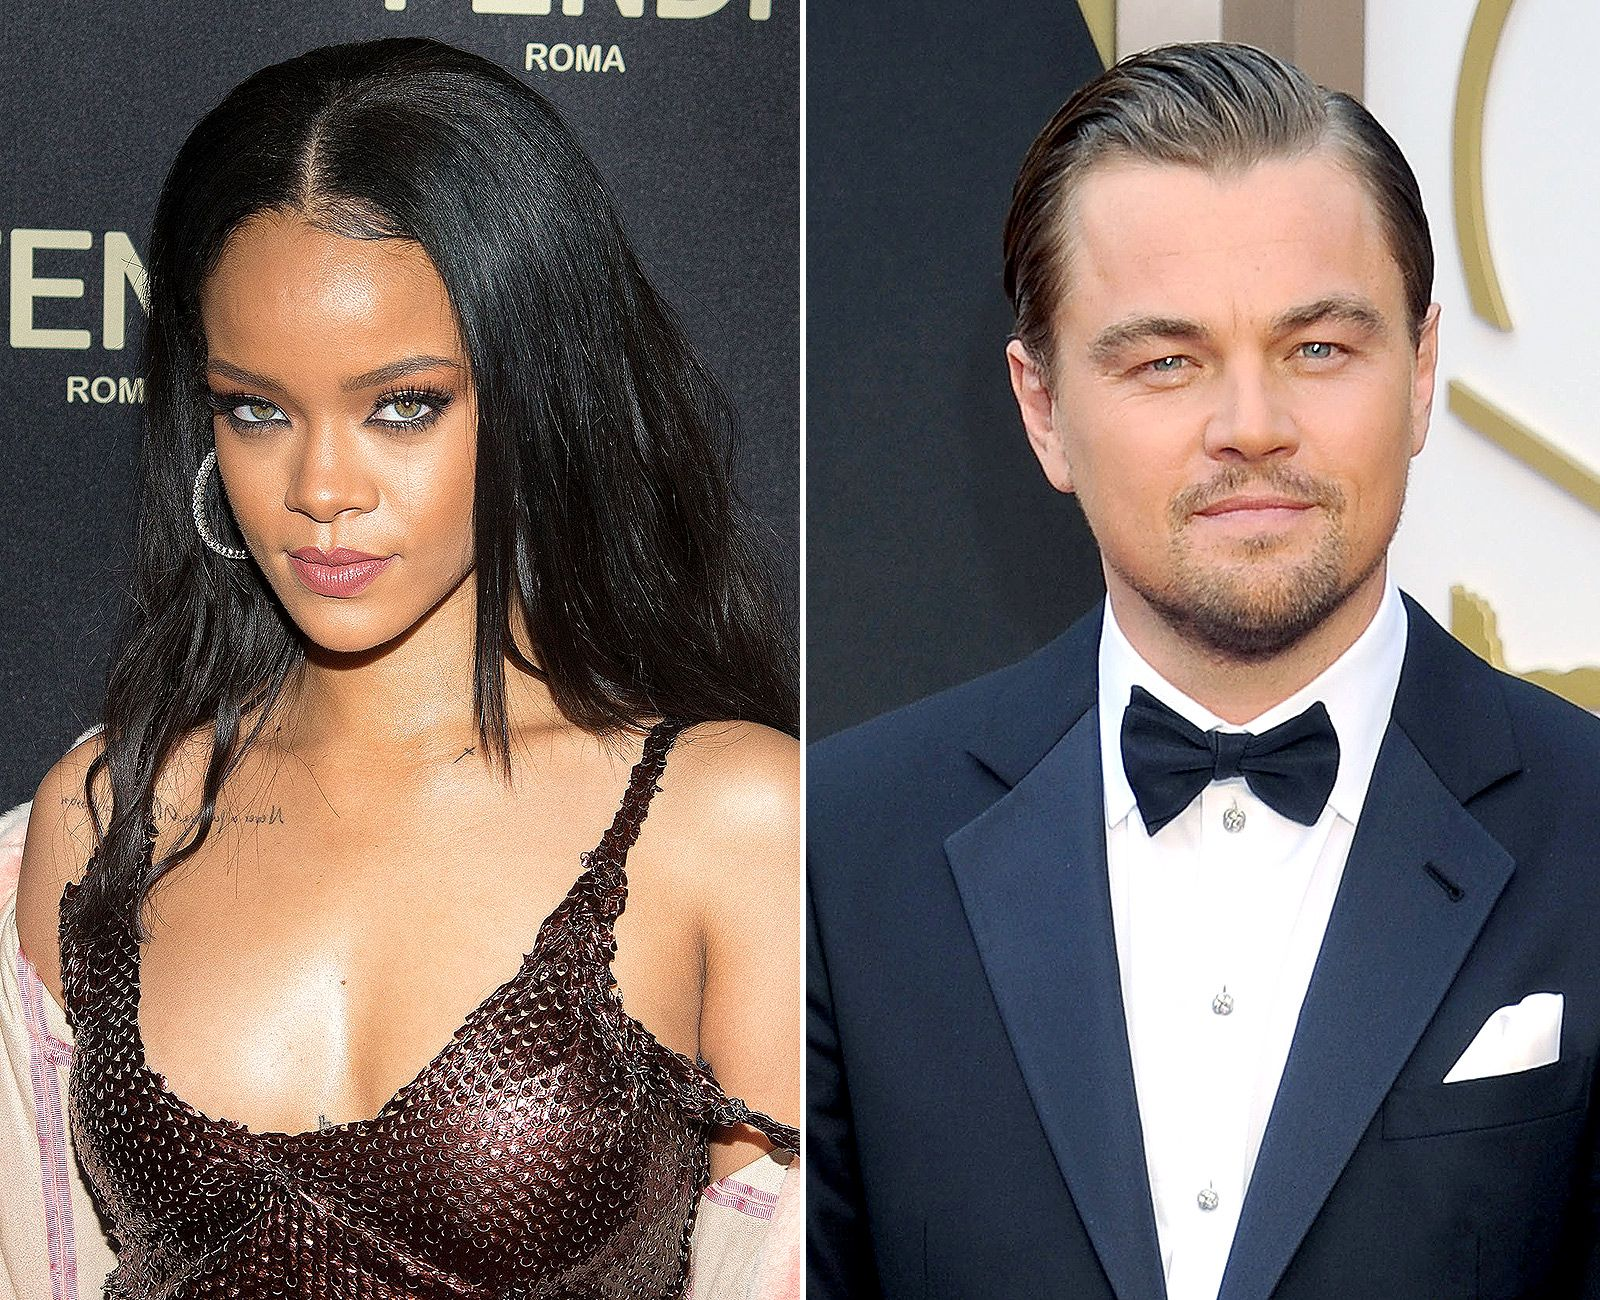 http://howomen.com/wp-content/uploads/2015/04/2-Rihanna-first-spoke-about-her-romance-with-Leonardo-DiCaprio.jpg